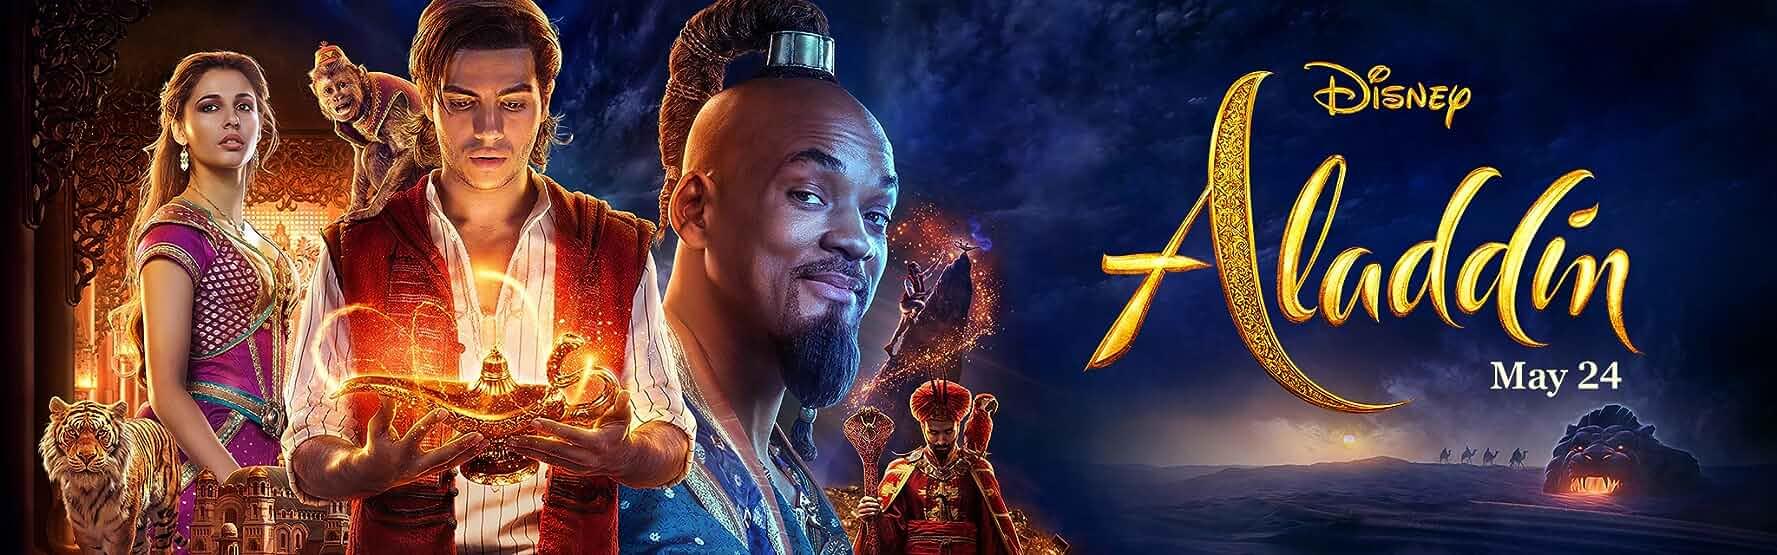 Will Smith, Alan Tudyk, Marwan Kenzari, Naomi Scott, and Mena Massoud in Aladdin (2019)